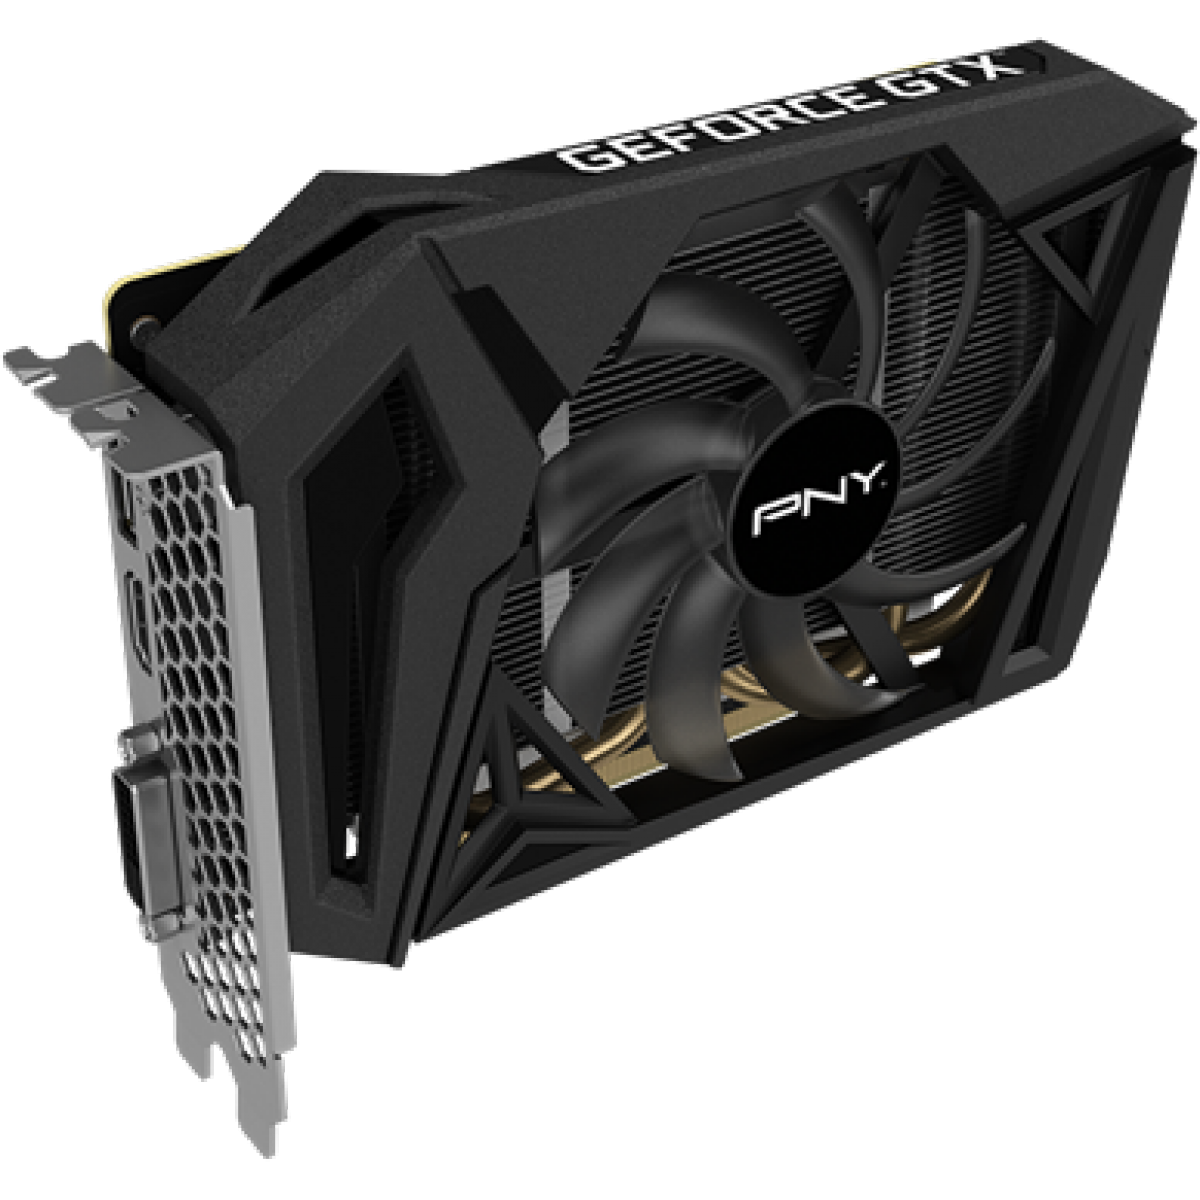 Placa de Vídeo PNY Geforce GTX 1660 Super 6GB, GDDR6, 192Bit